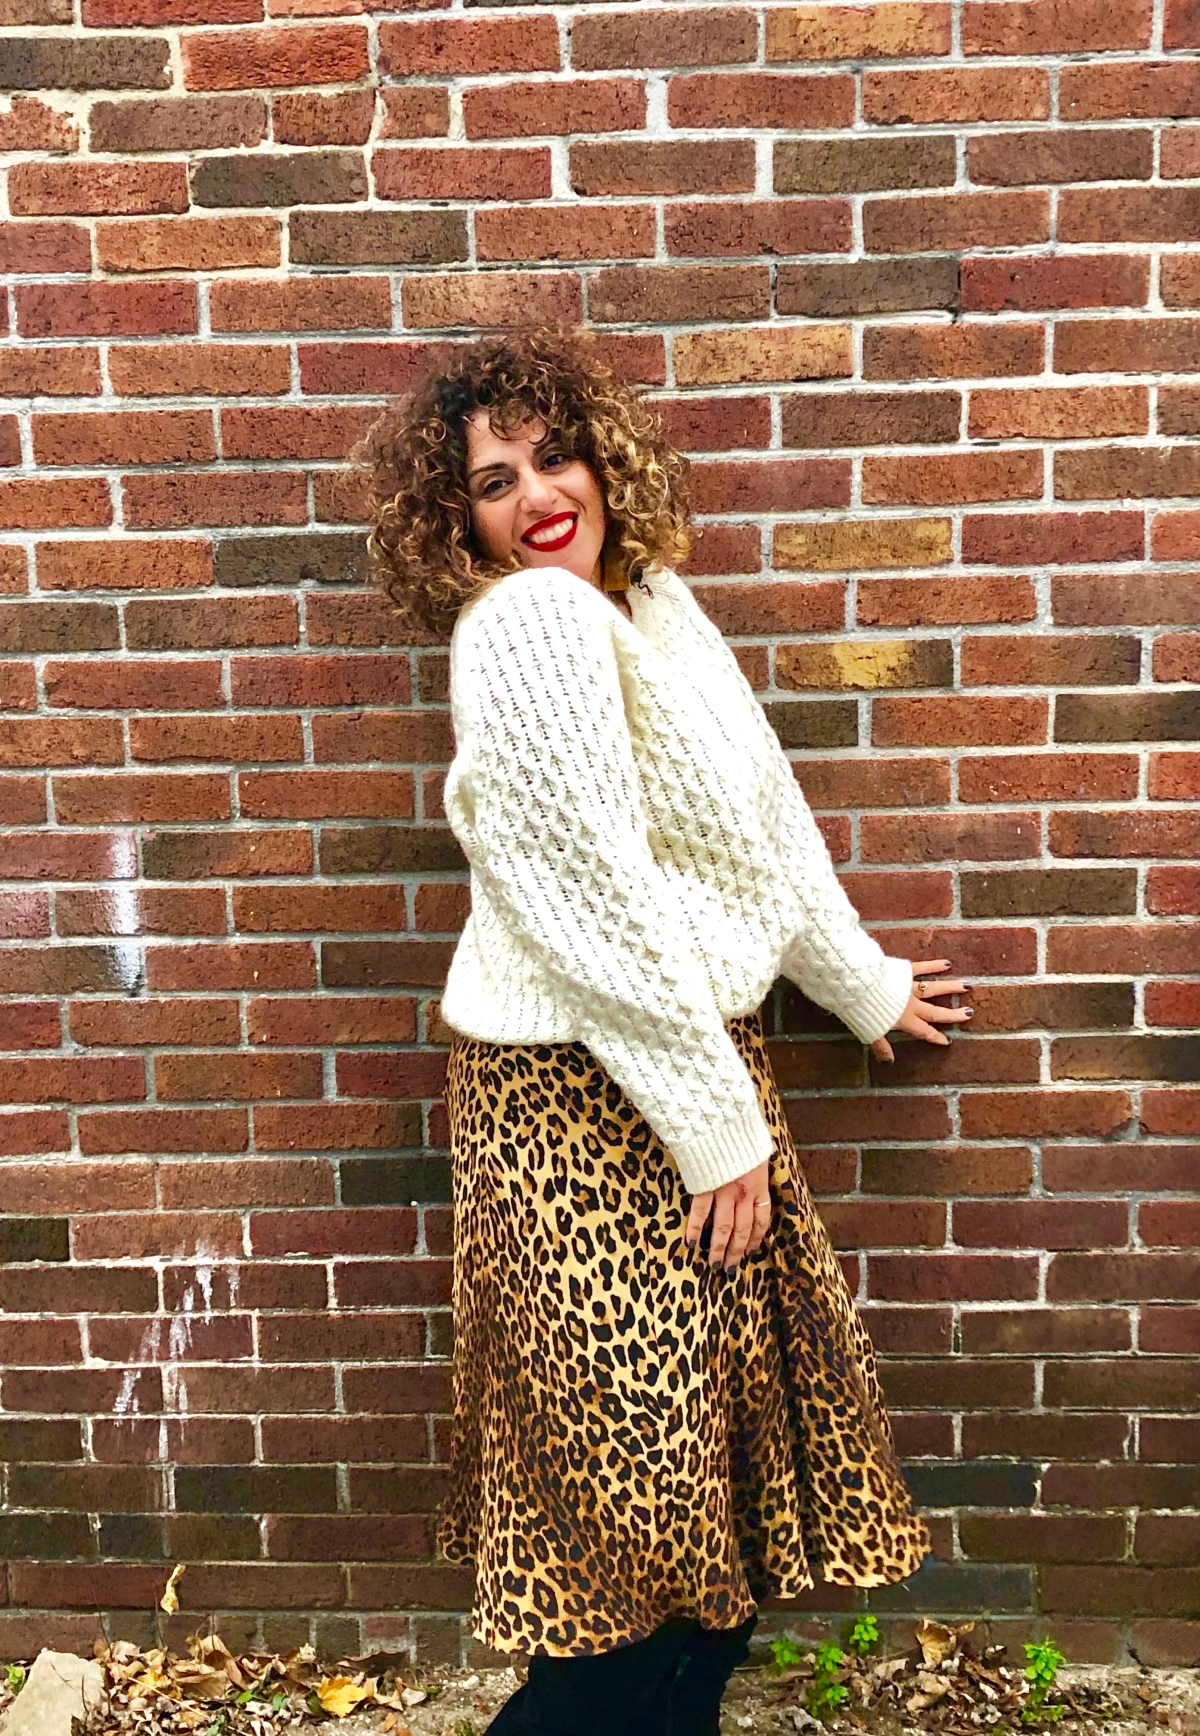 OOTD: Chunky Sweater and Cheetah Print SoftSkirt